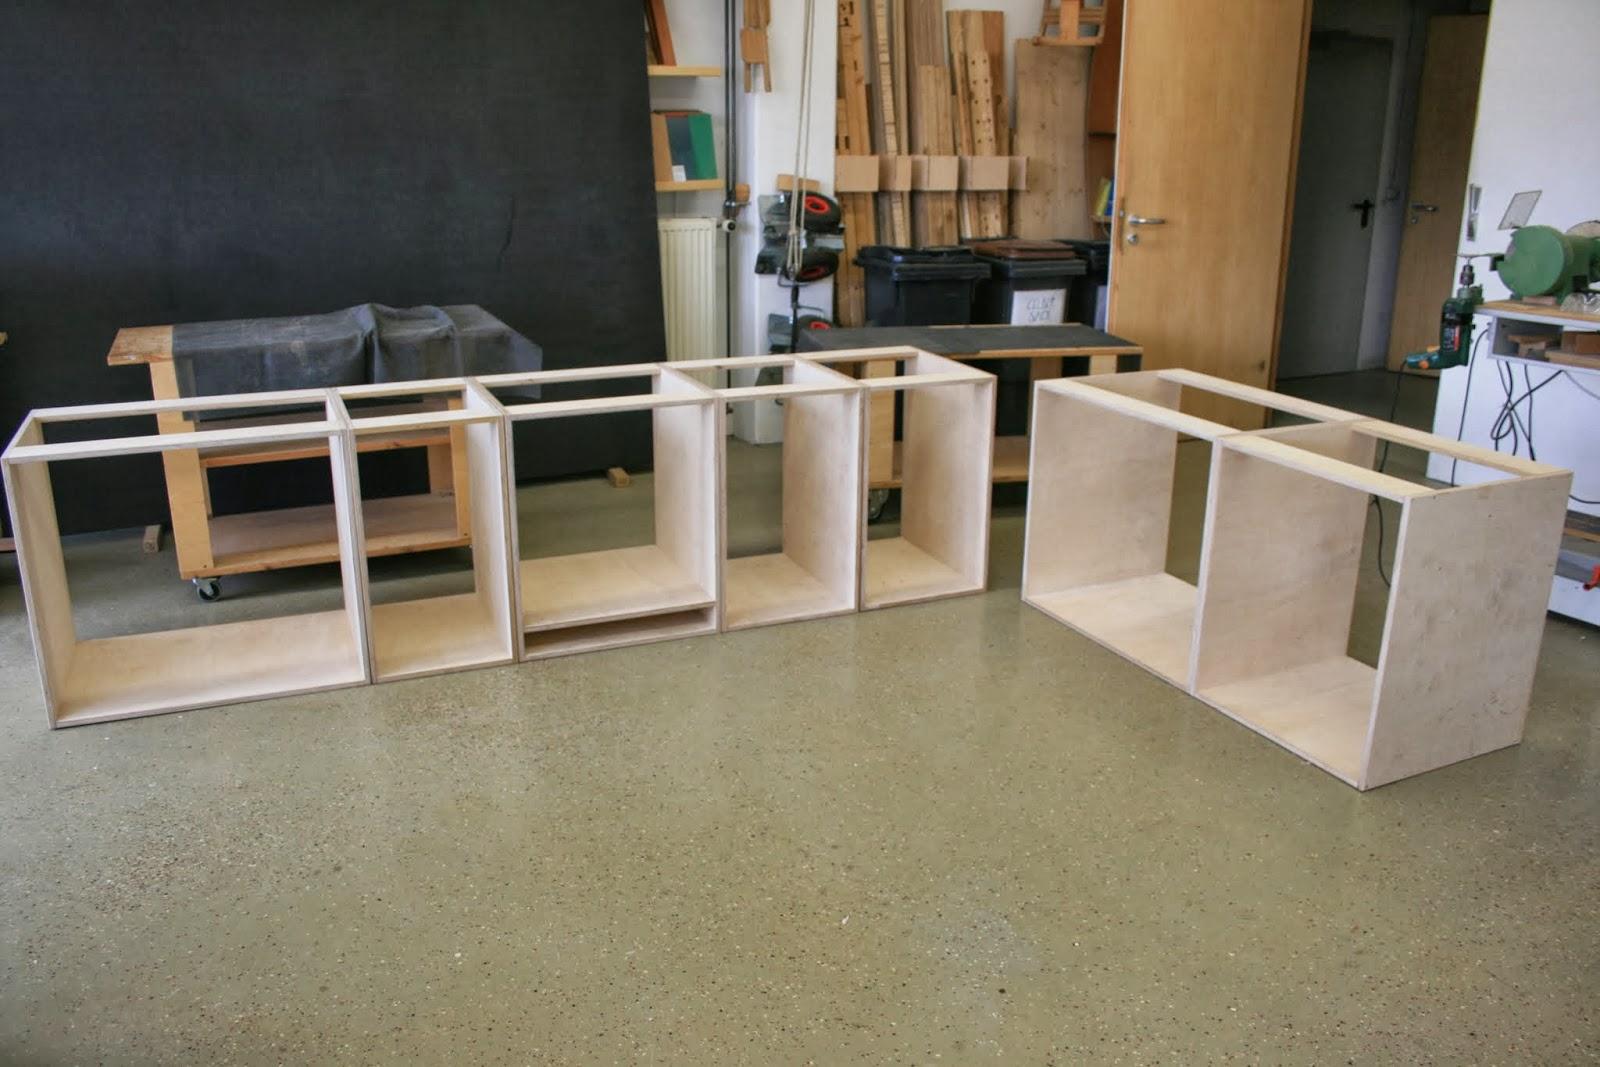 Outdoor Küchen Selbst Gebaut : Outdoor küche holz bauen outdoor küche aus holz bauen